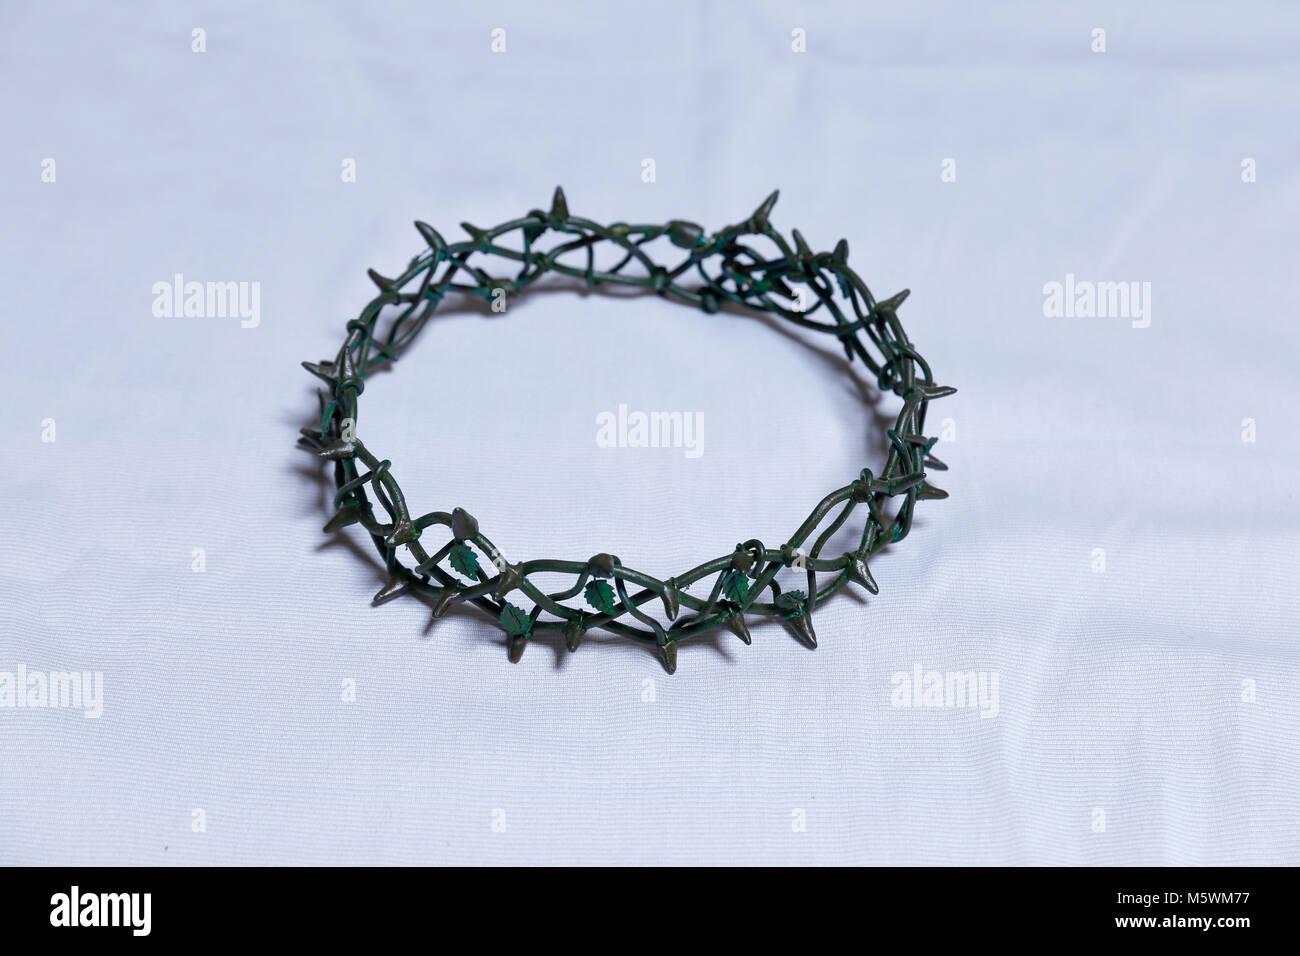 Symbol Of The Crown Thorn On Calvary Jesus Christ